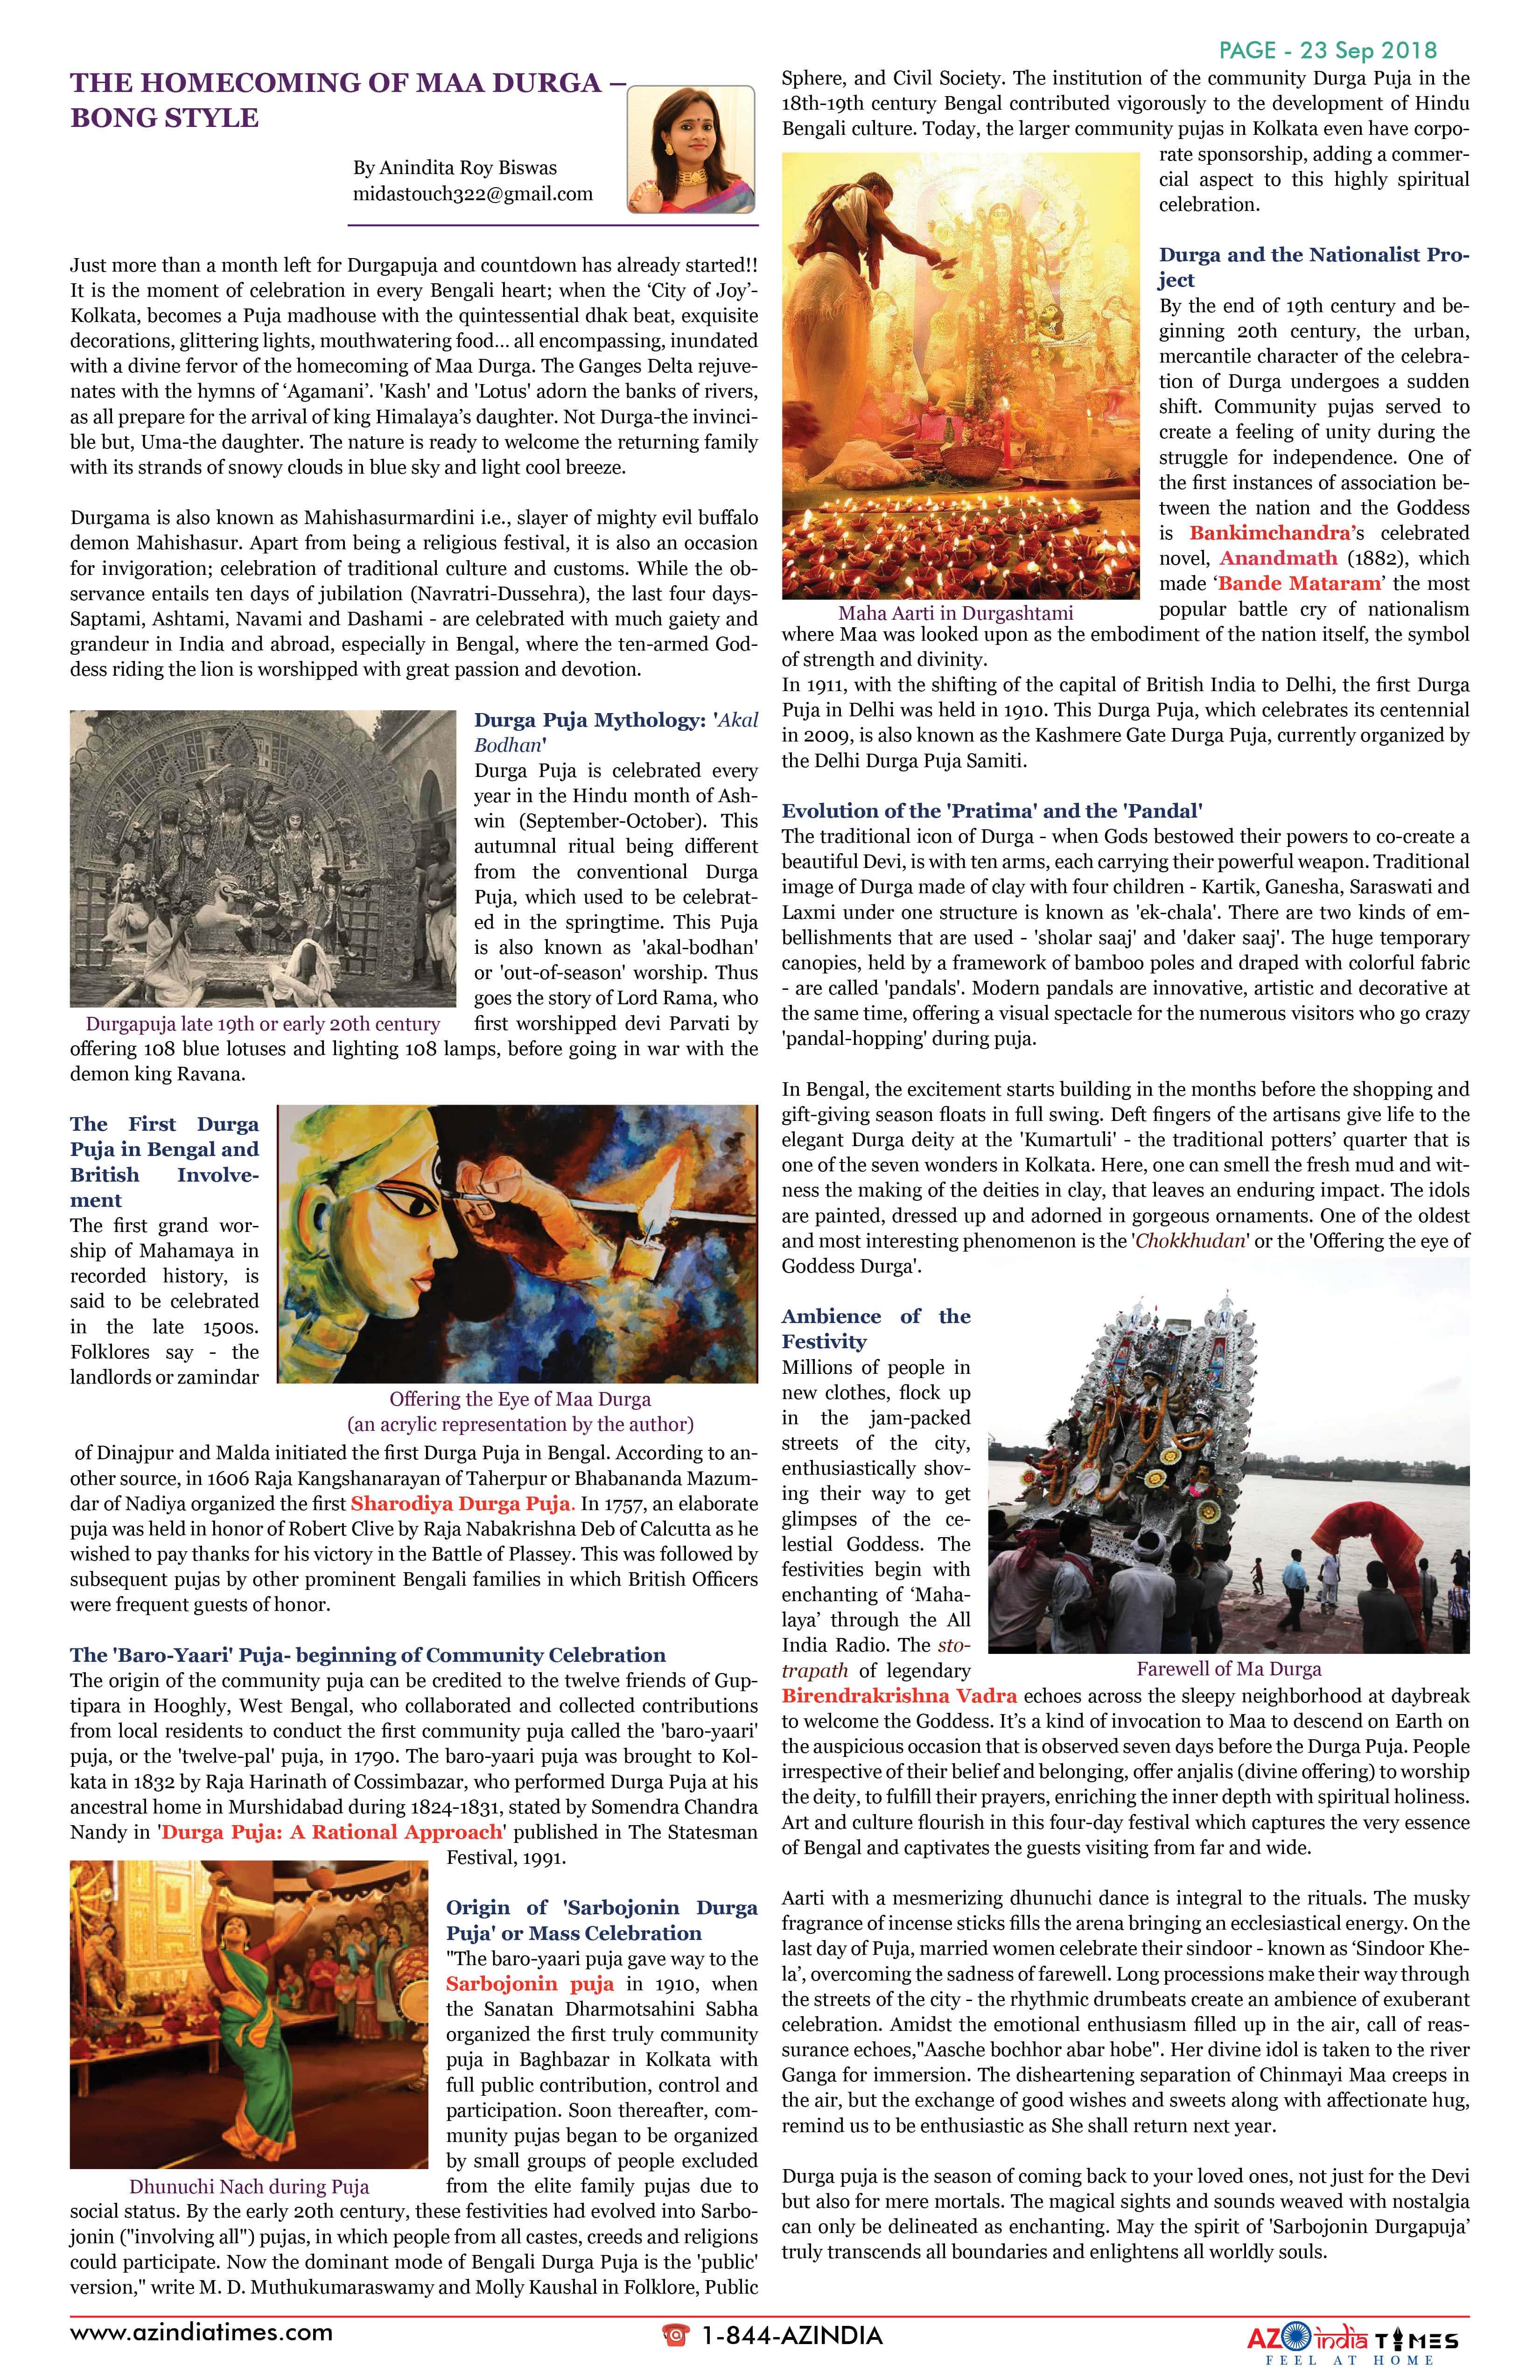 AZ INDIA SEPTEMBER  EDITION 23